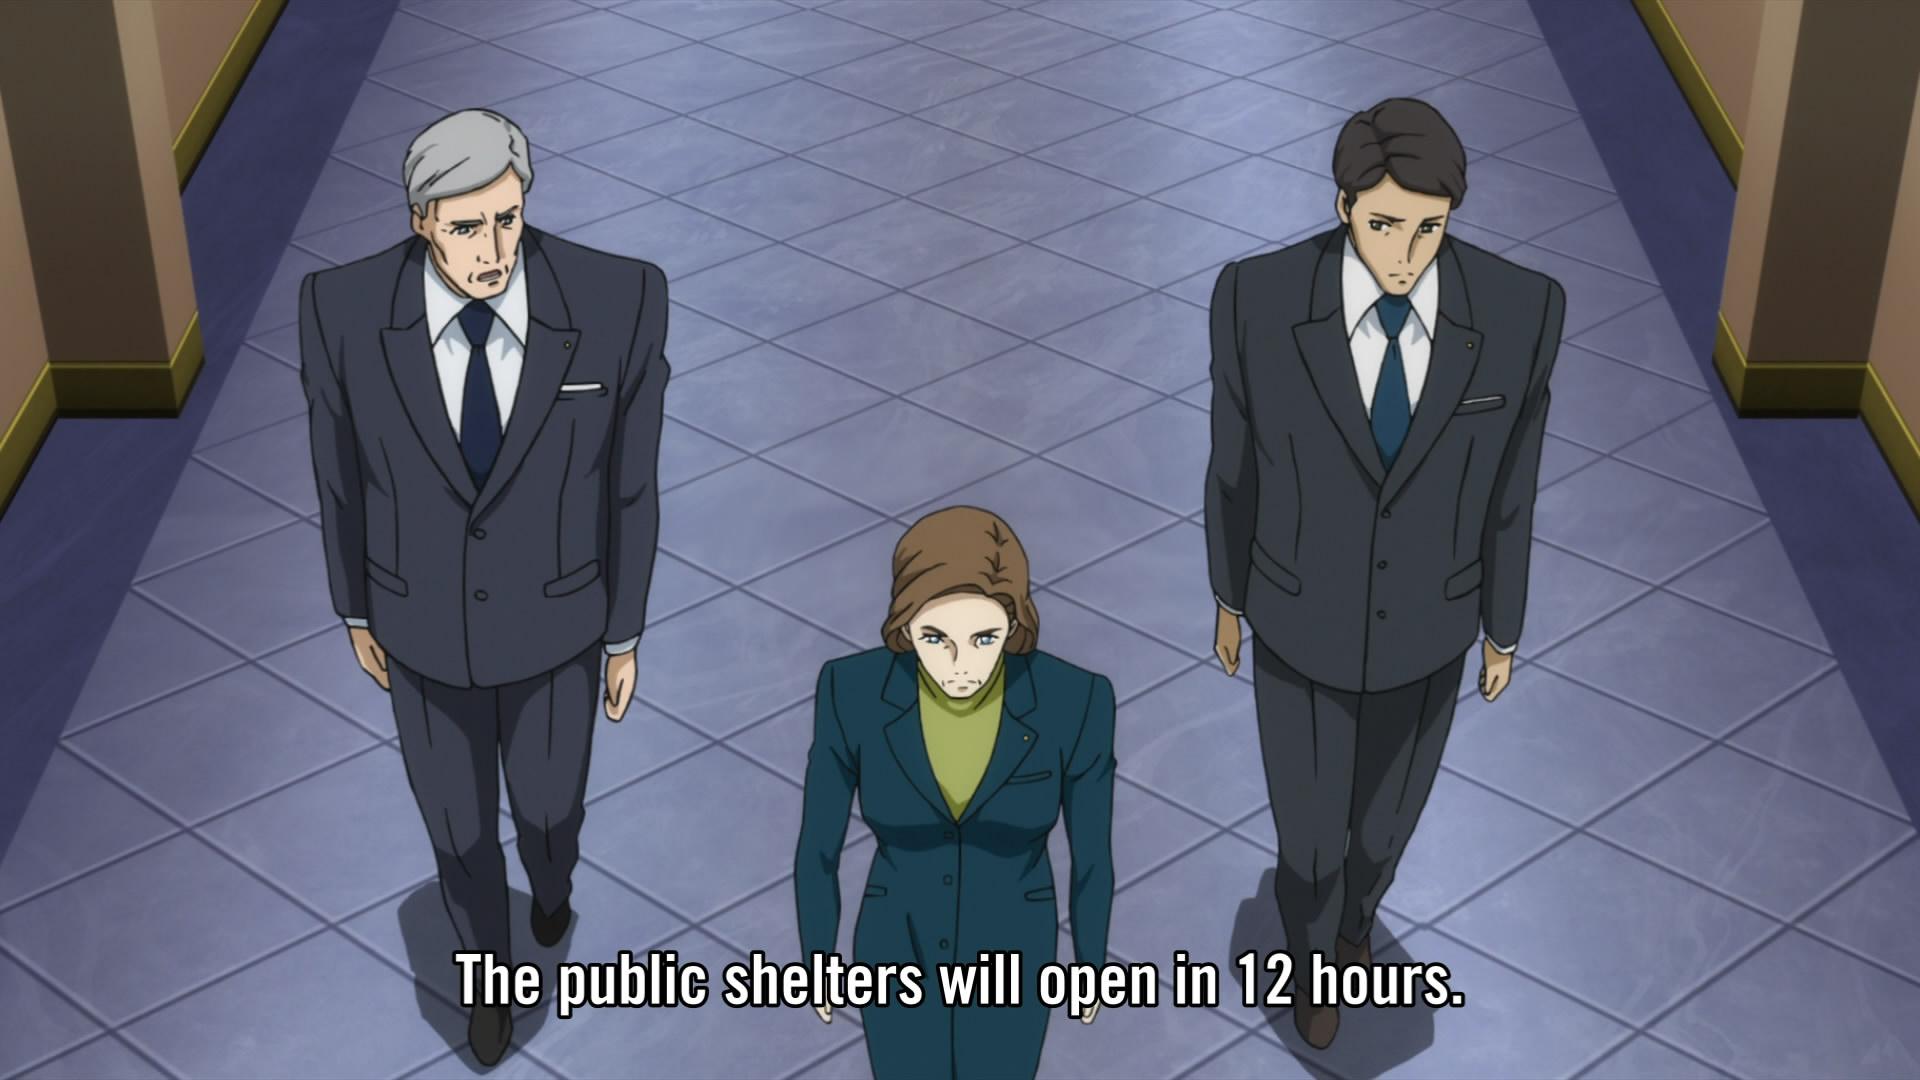 [gSS]_Mobile_Suit_Gundam_00_-_A_wakening_of_the_Trailblazer_(1080p)_[2B252856].mkv_snapshot_01.17.51_[2011.01.07_04.42.01]